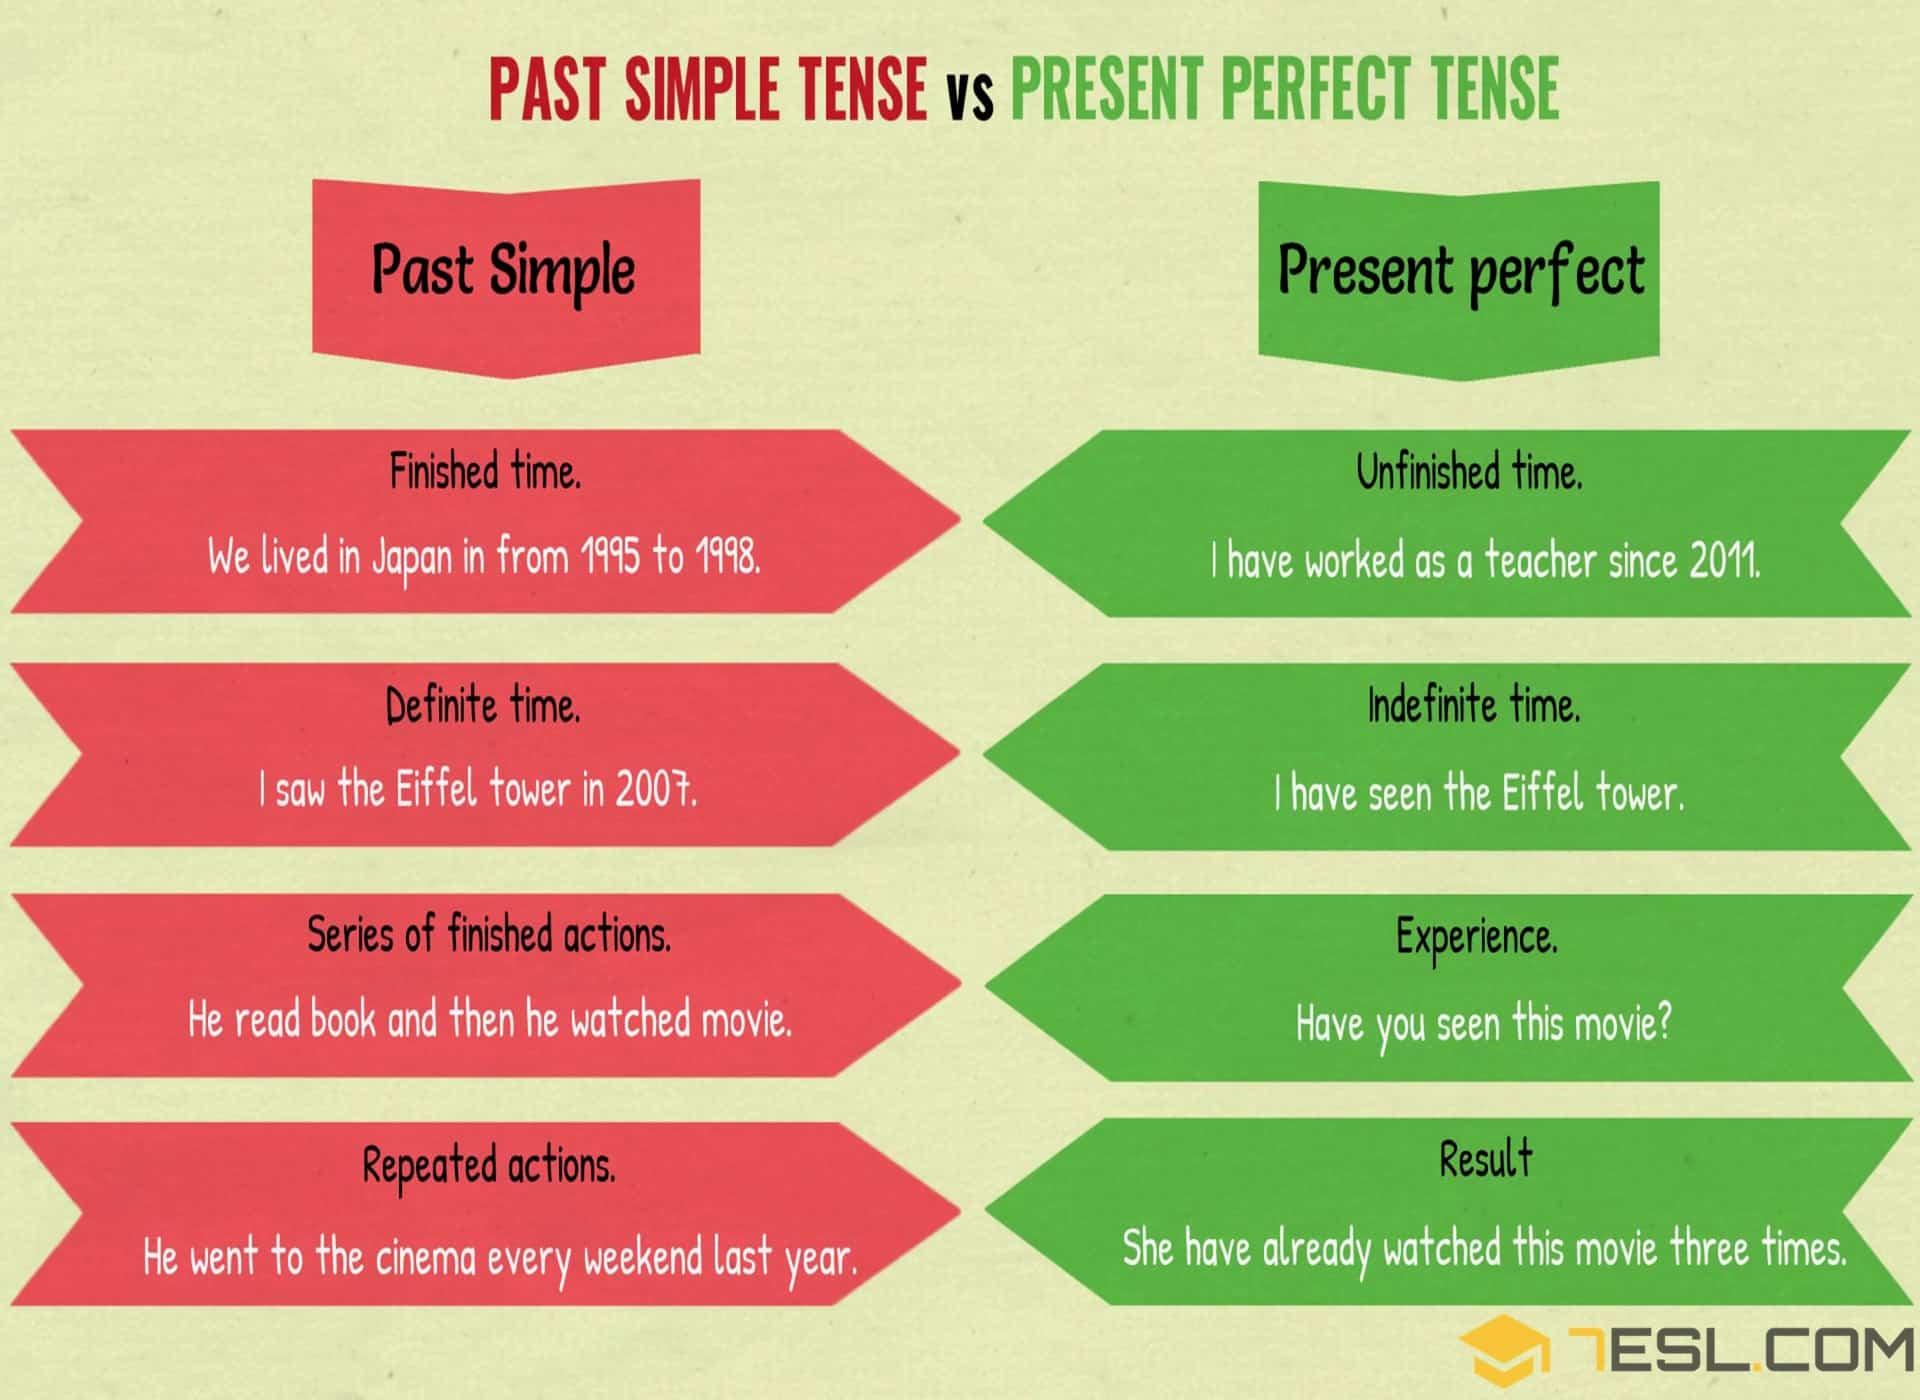 Past Simple Tense Vs Present Perfect Tense